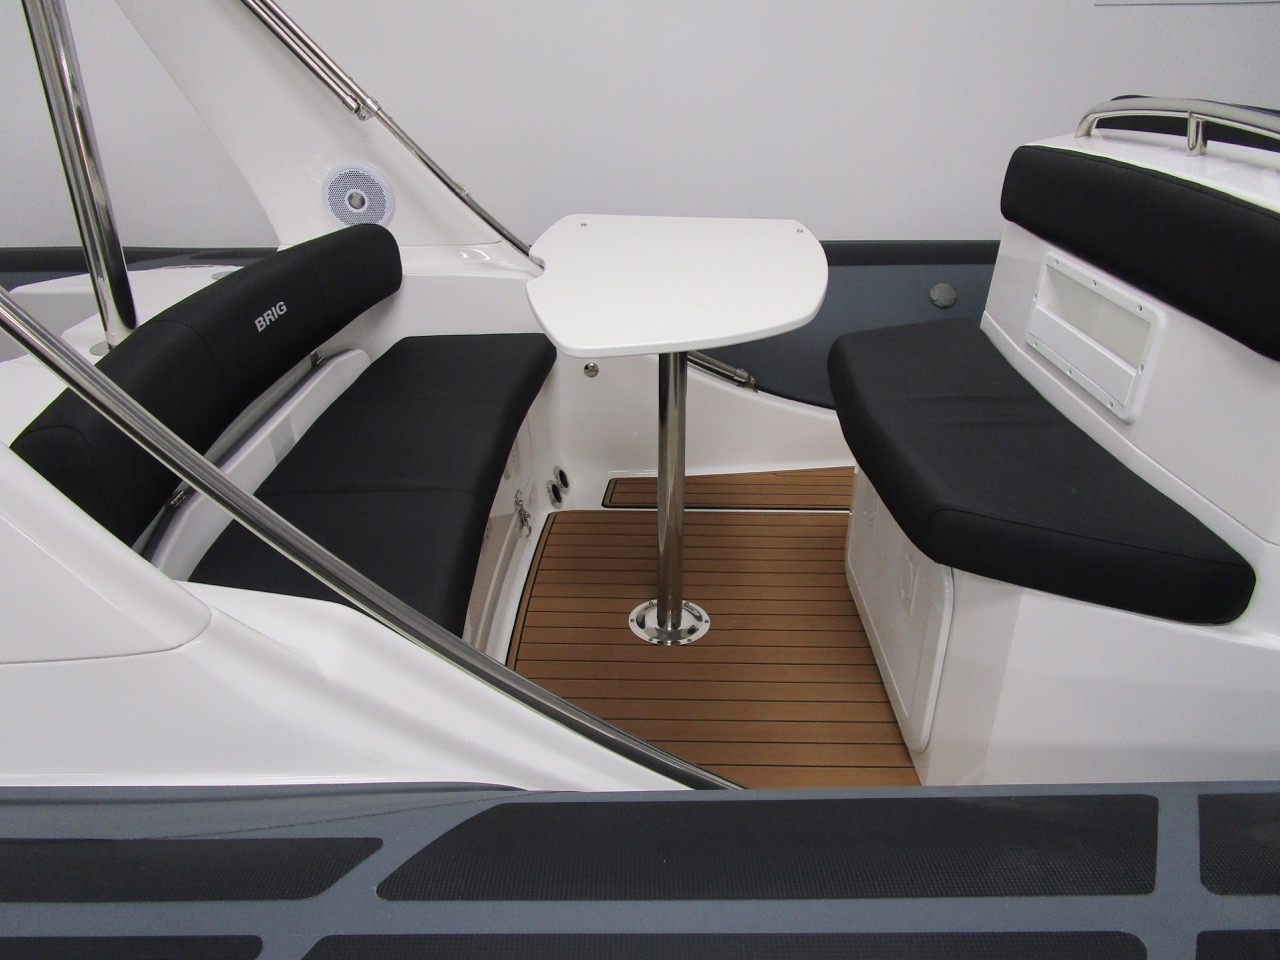 E780 - Rear seats and table